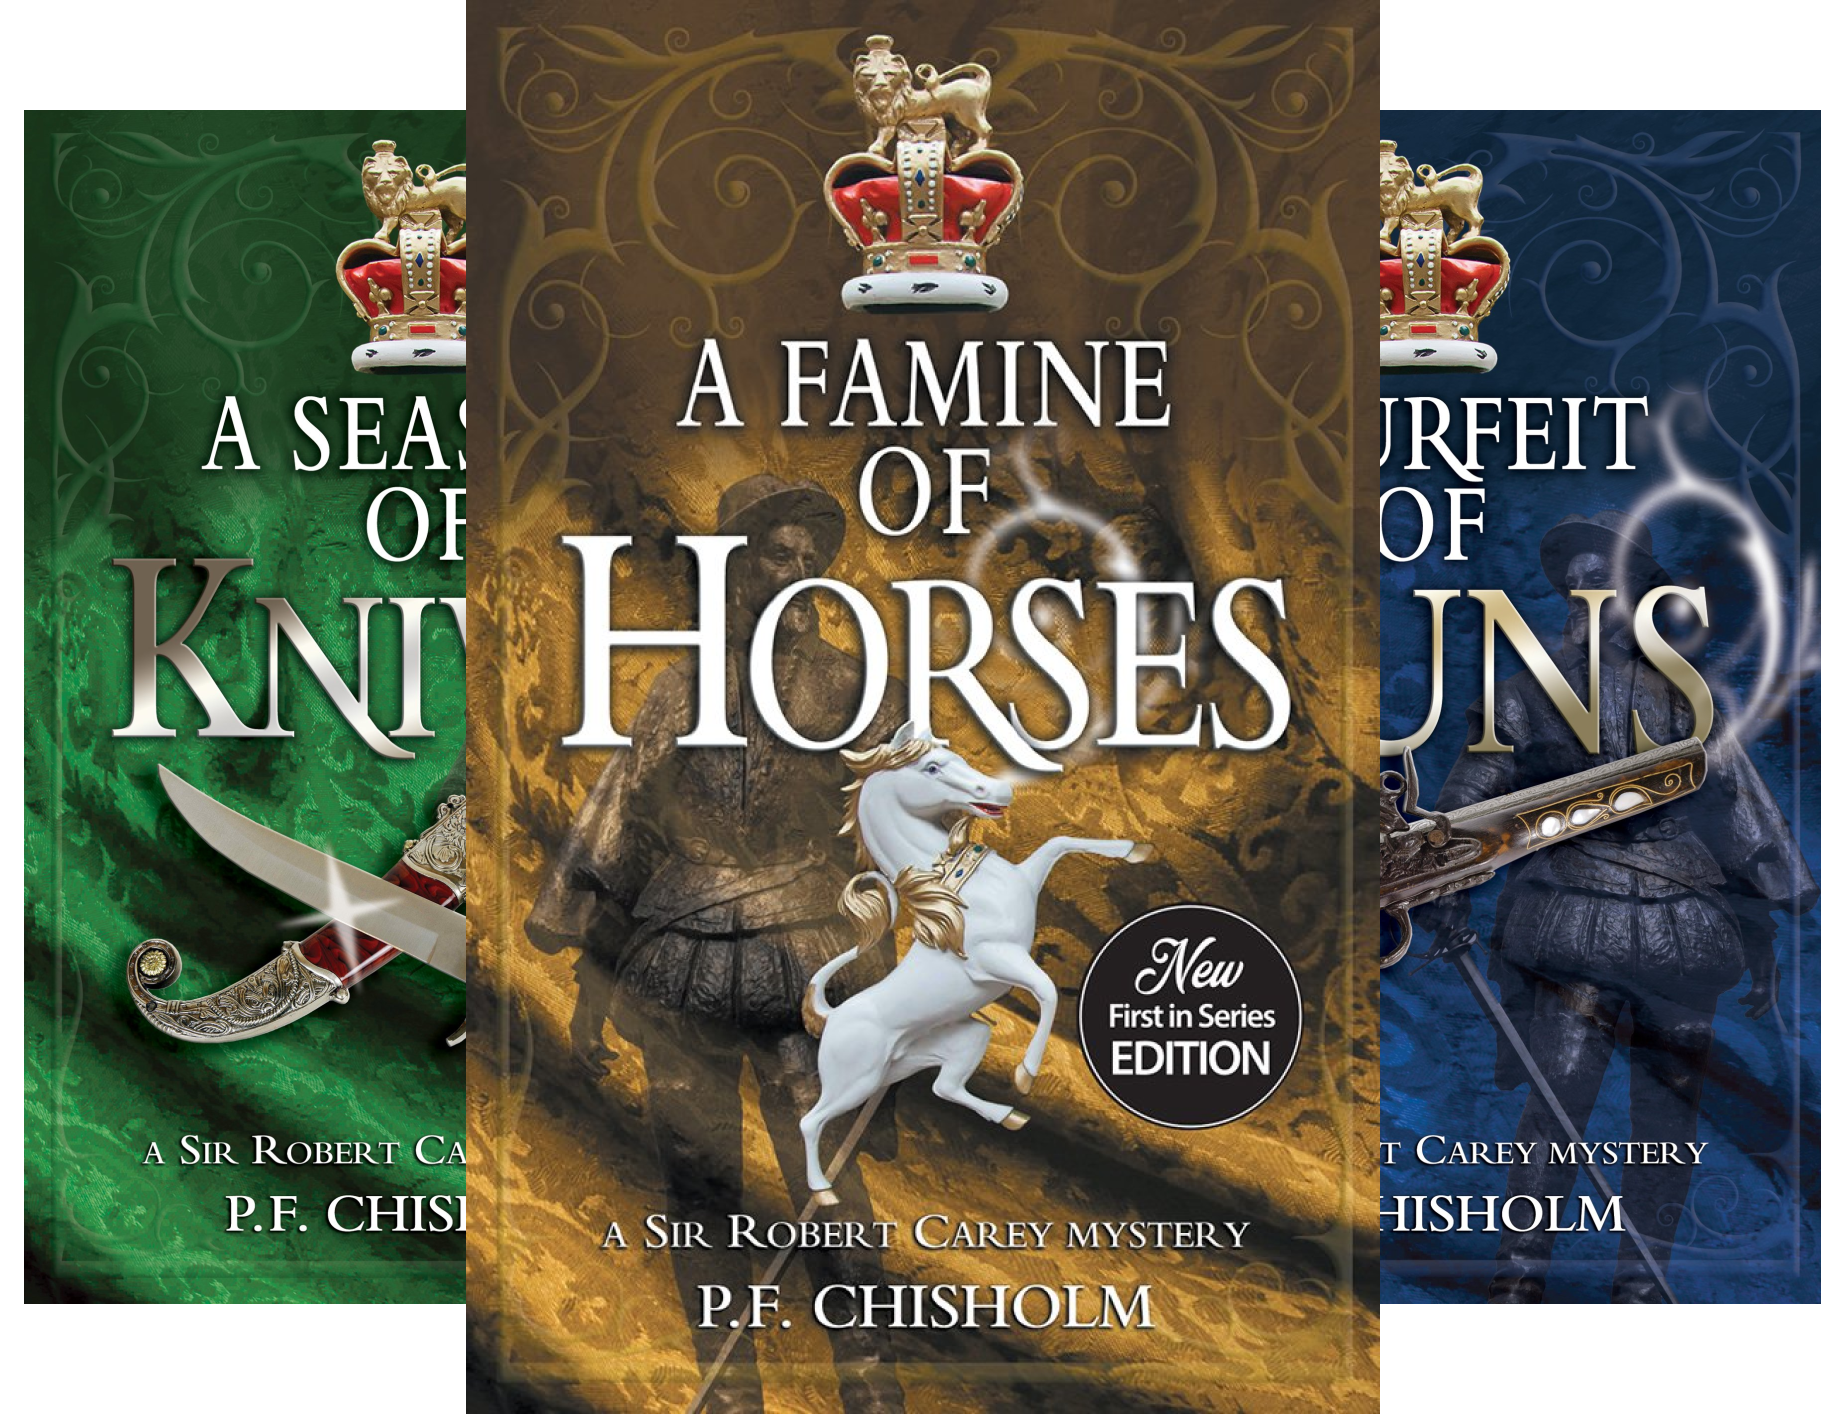 Sir Robert Carey Mysteries (9 Book Series)